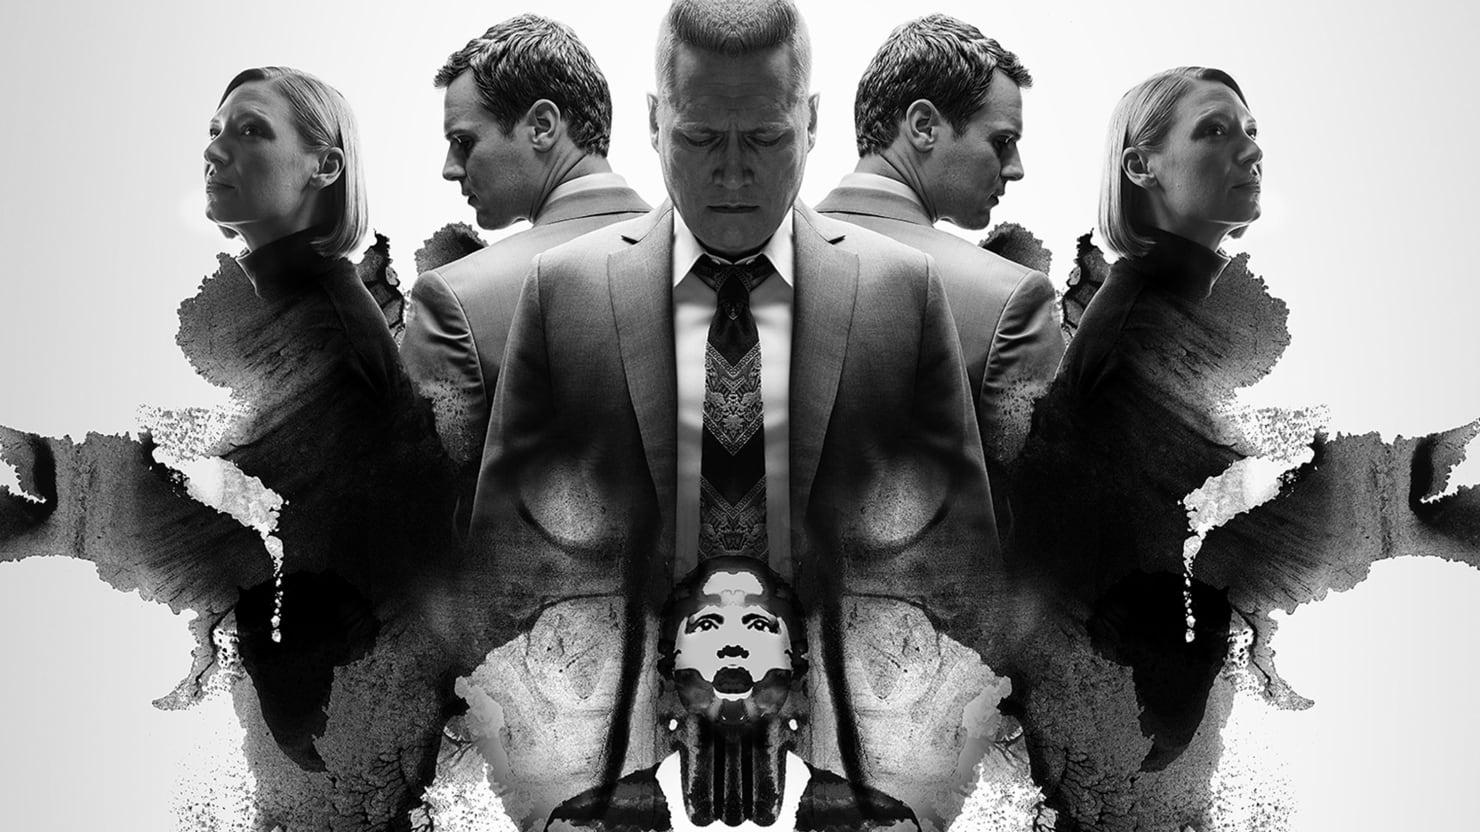 'Mindhunter' Season 2: Netflix Journeys Into the Twisted Minds of Charles Manson, Son of Sam, and BTK Killer